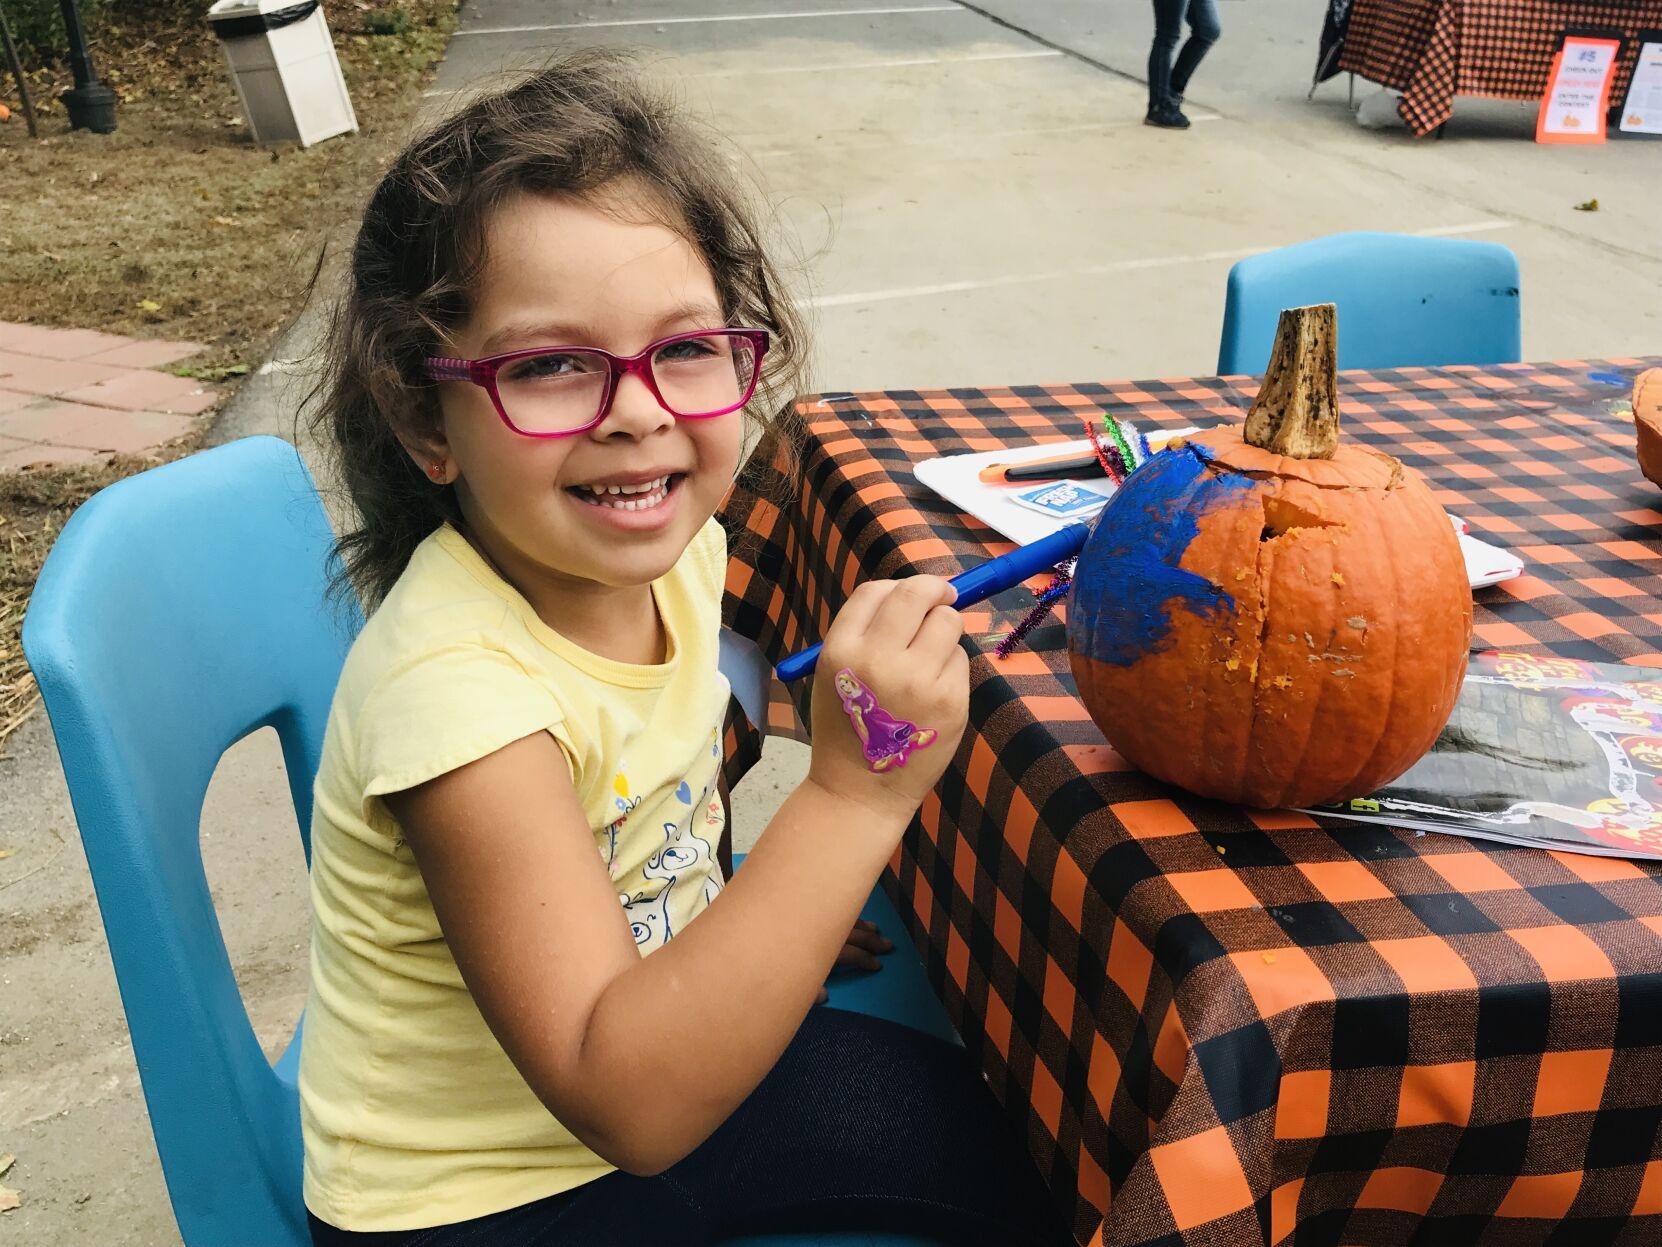 Pumpkins on parade: Children enjoy crafty event at community center